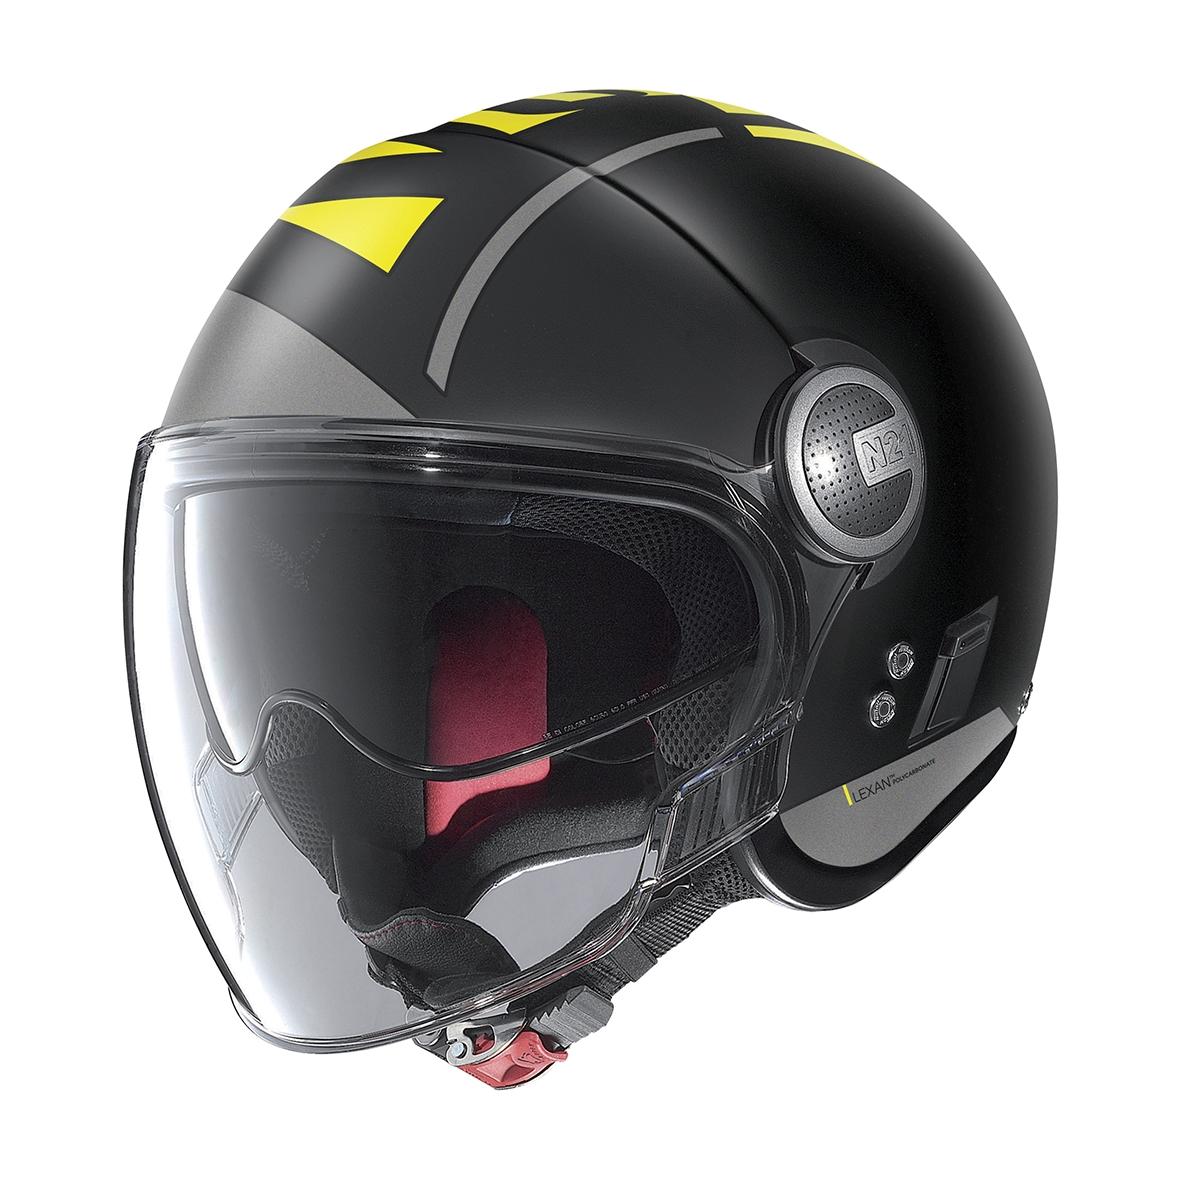 Moto helma Nolan N21 Visor Avant-Garde Flat Black 74